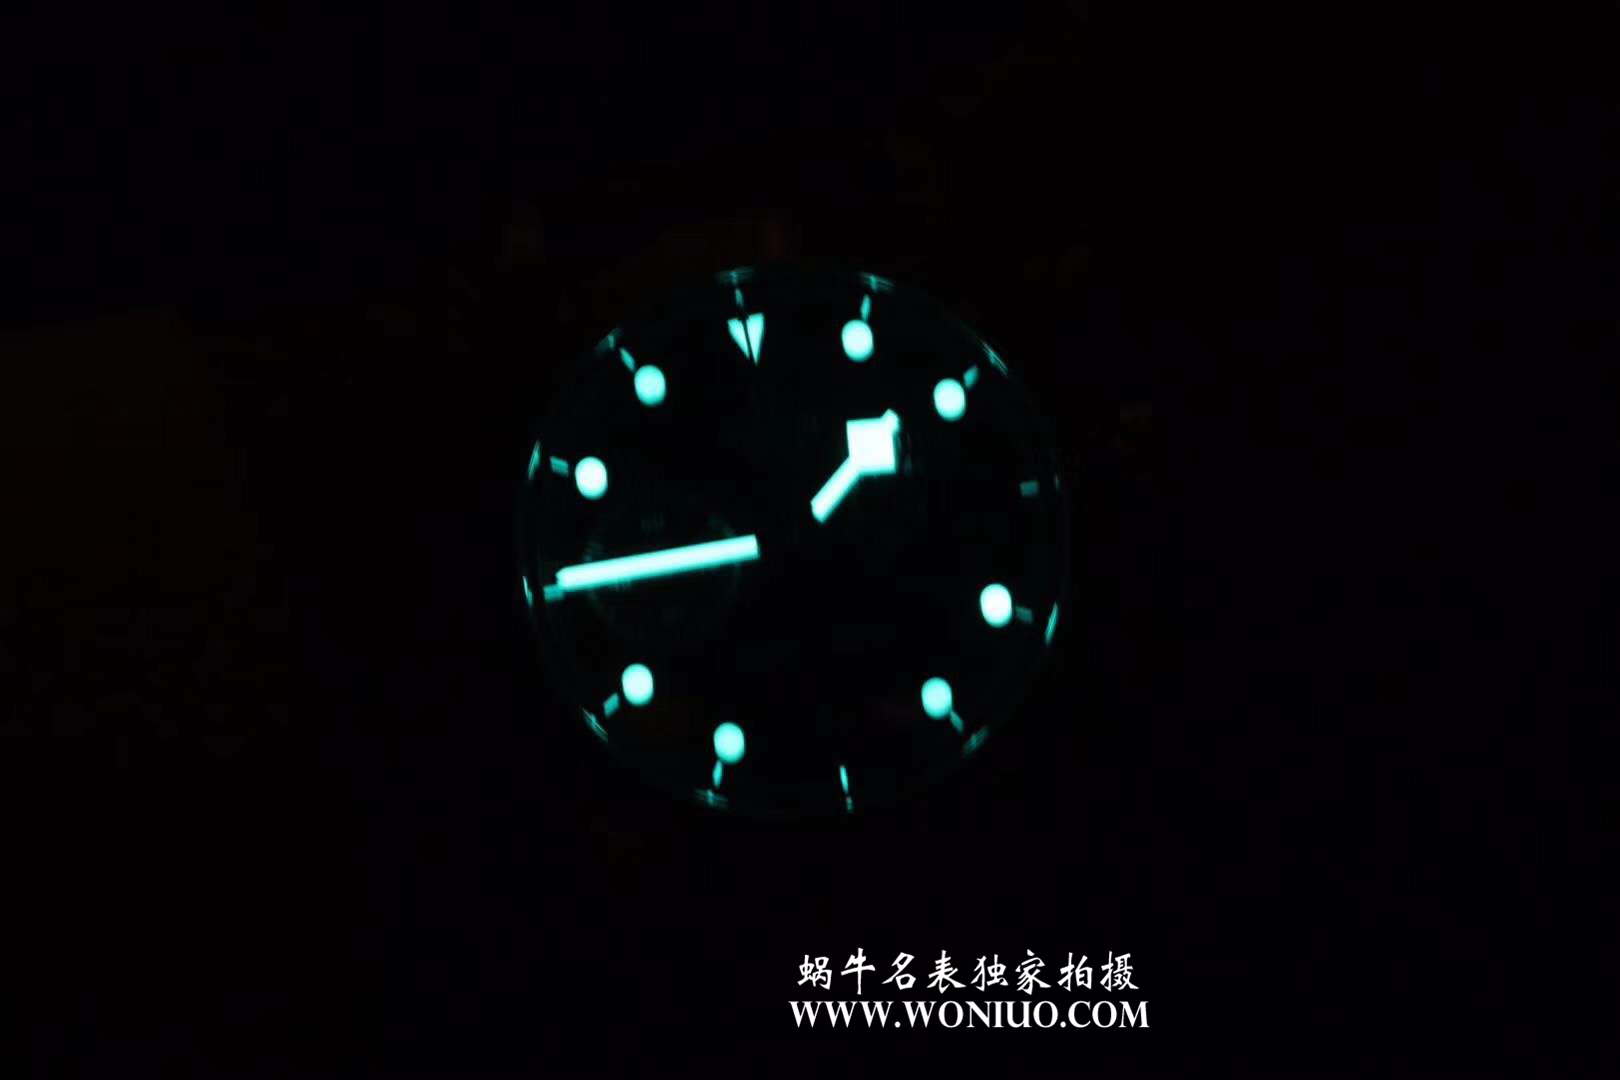 【ZF一比一超A高仿手表】帝舵启承系列79350腕表 / DT018